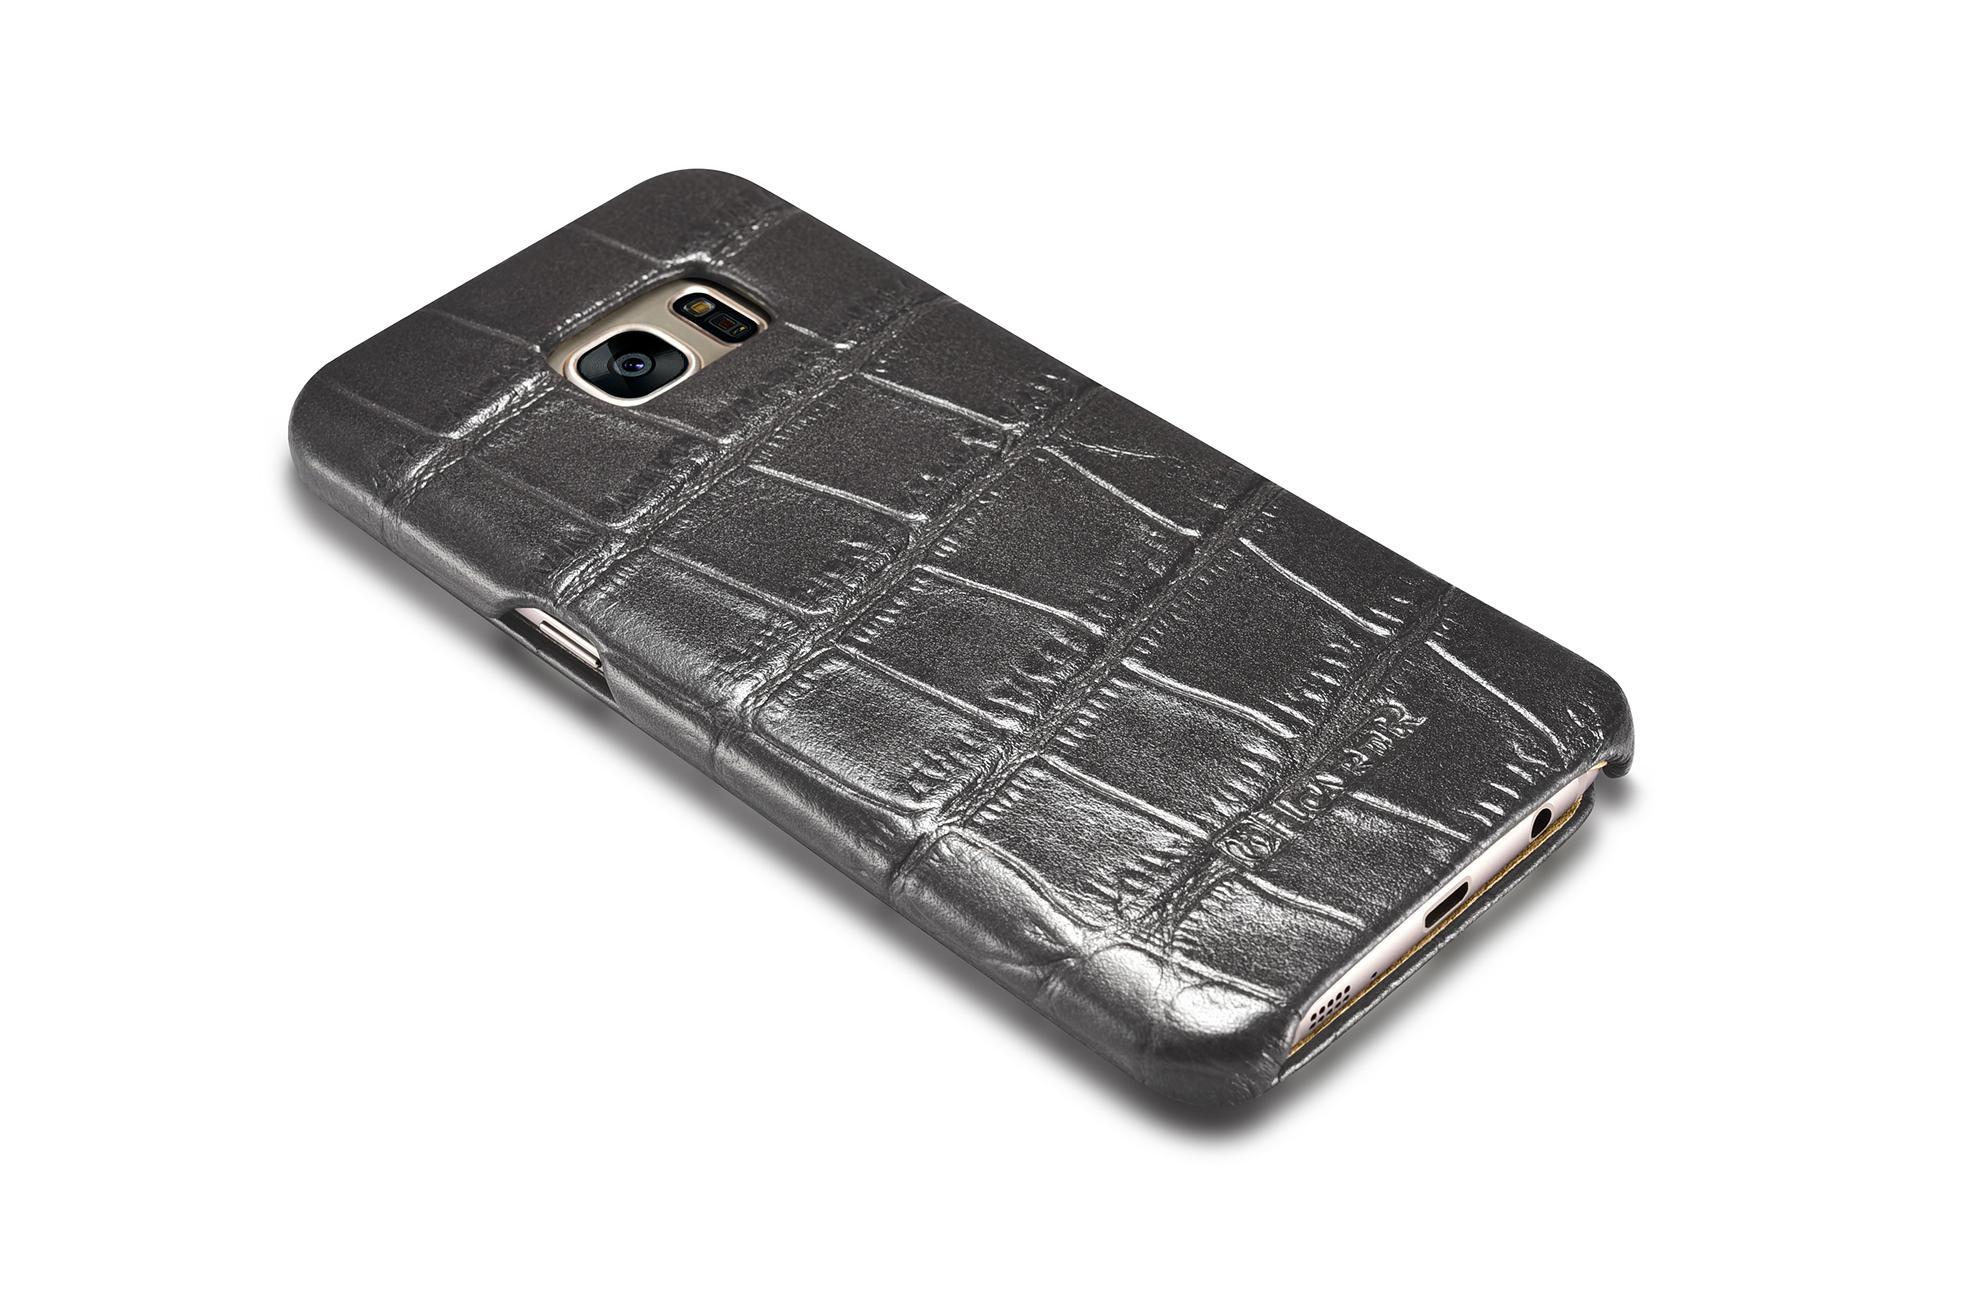 iCarer Samsung Galaxy S7 Edge Embossed Crocodile Genuine Leather Folio Case 11